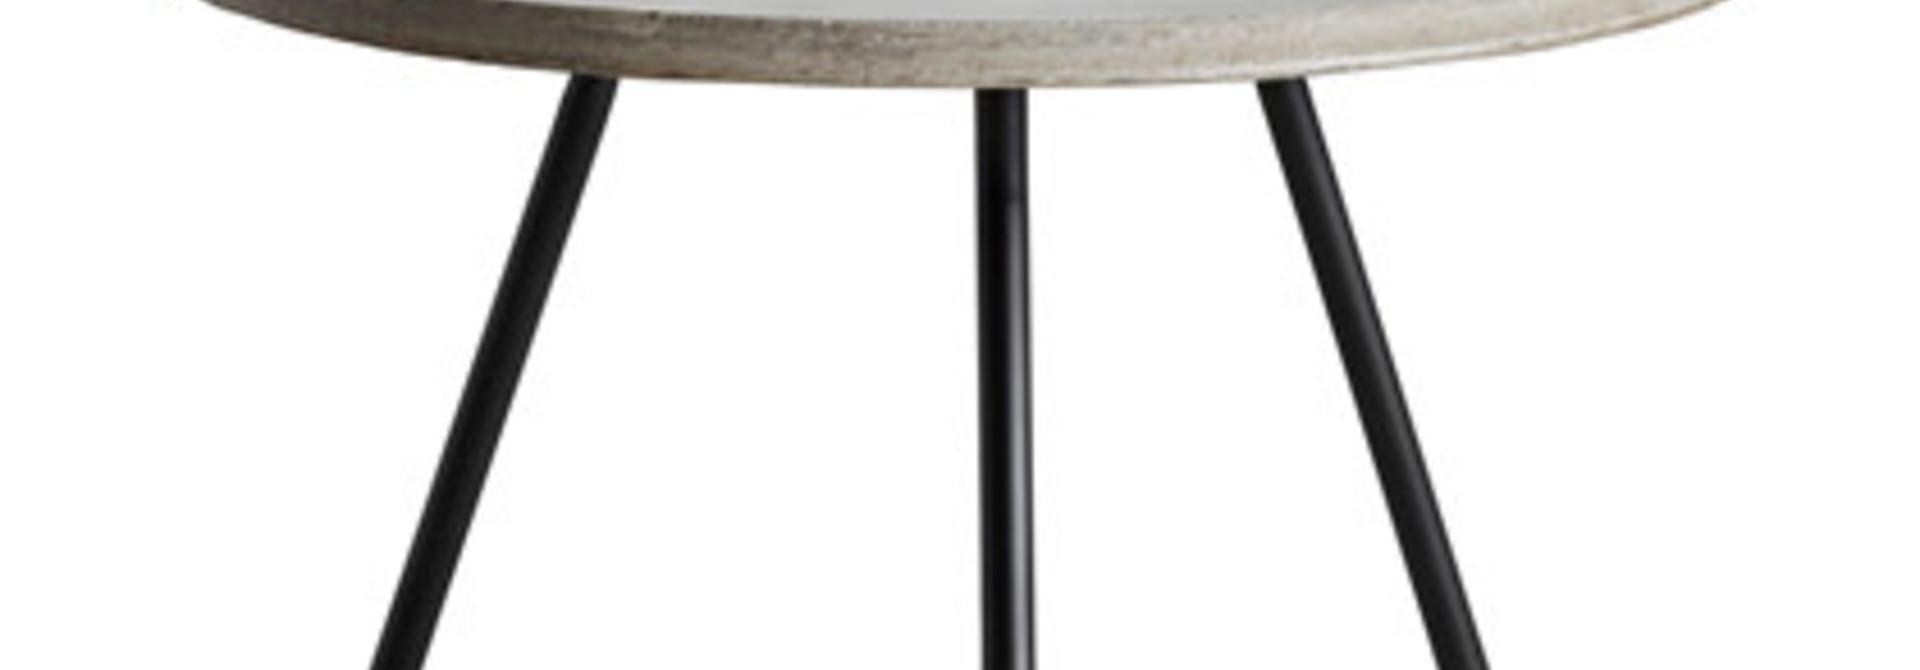 Soround Coffee Table - Concrete